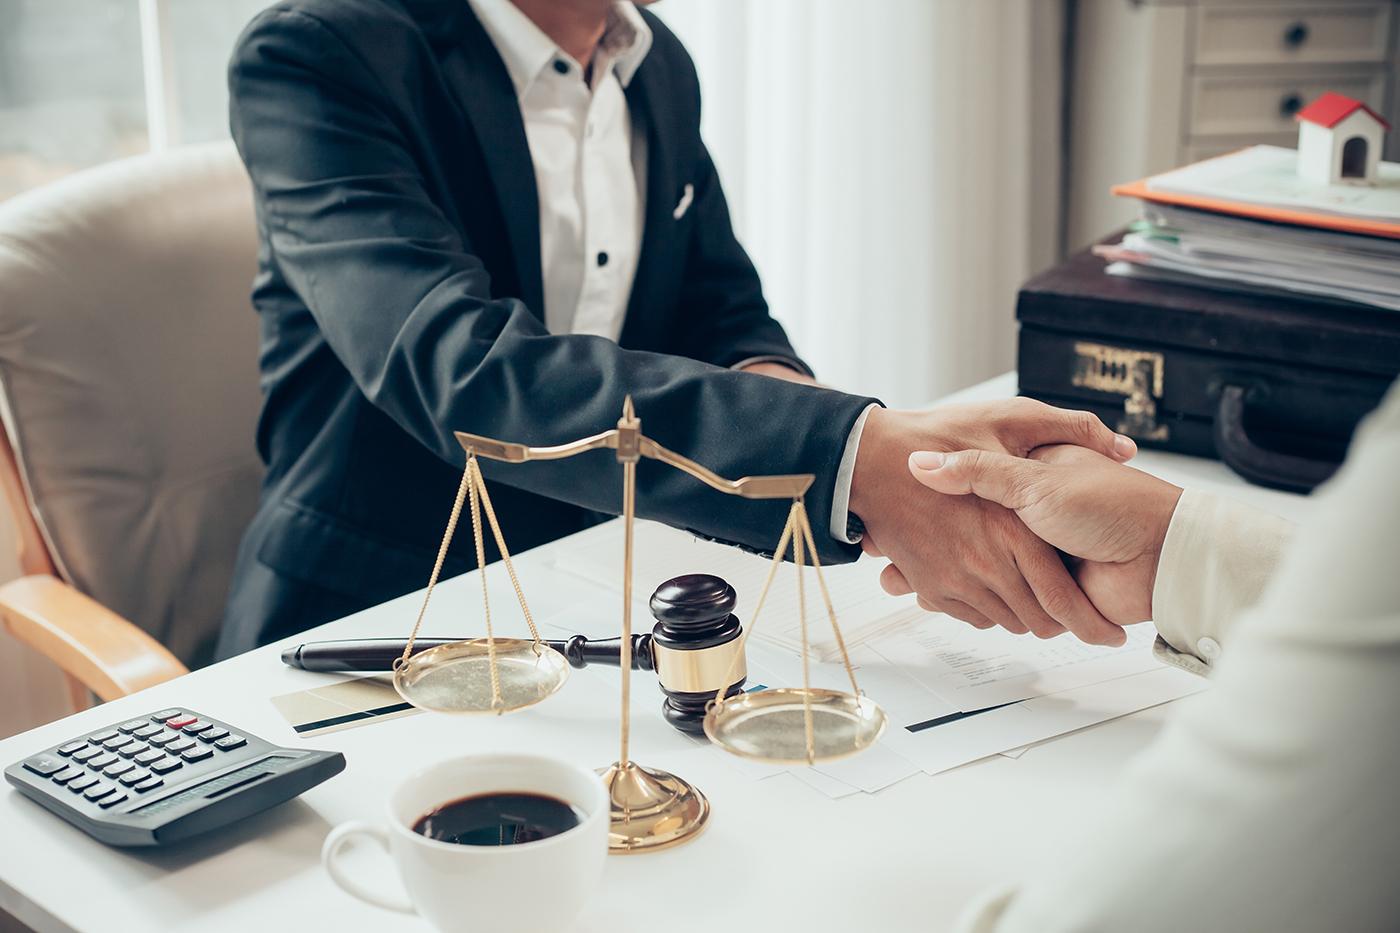 Southampton, Havertown & Perkasie, PA Credit Card Lawsuit Defense Lawyer